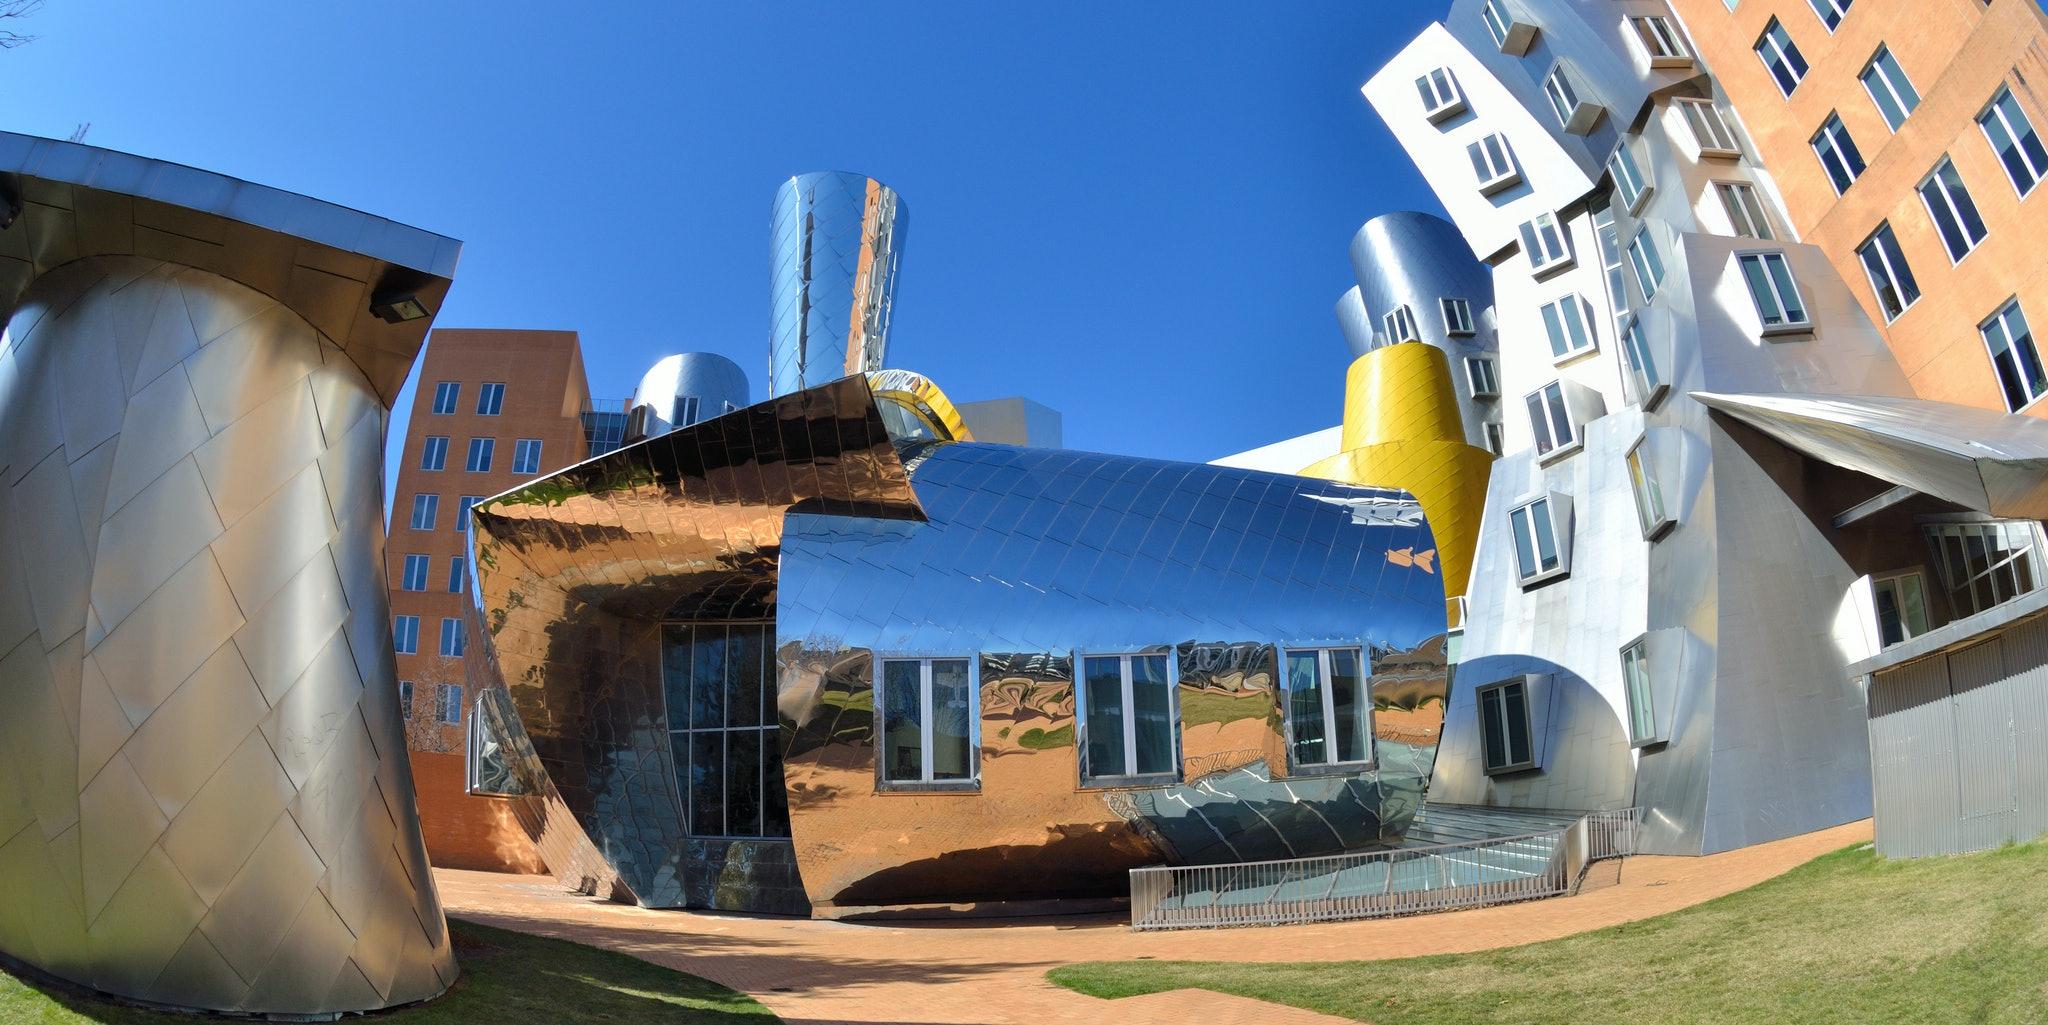 Massachusetts Institute of Technology dome.